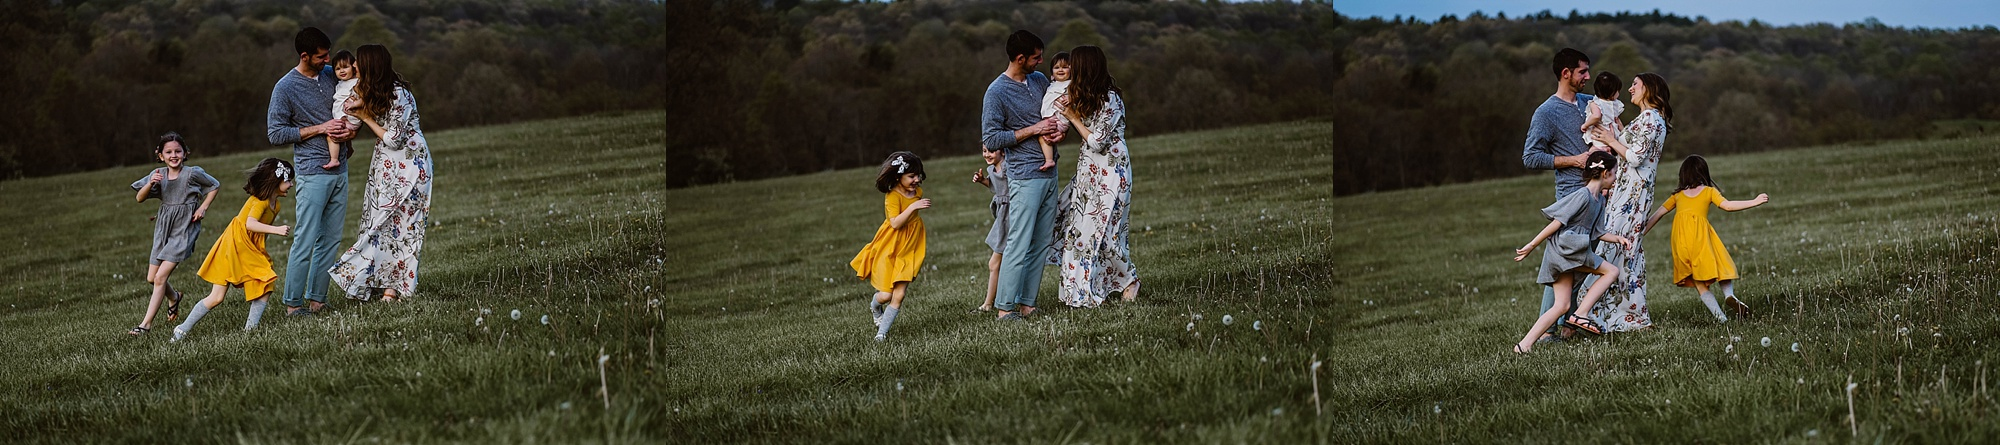 lauren-grayson-akron-ohio-family-photographer-molly_0014.jpg